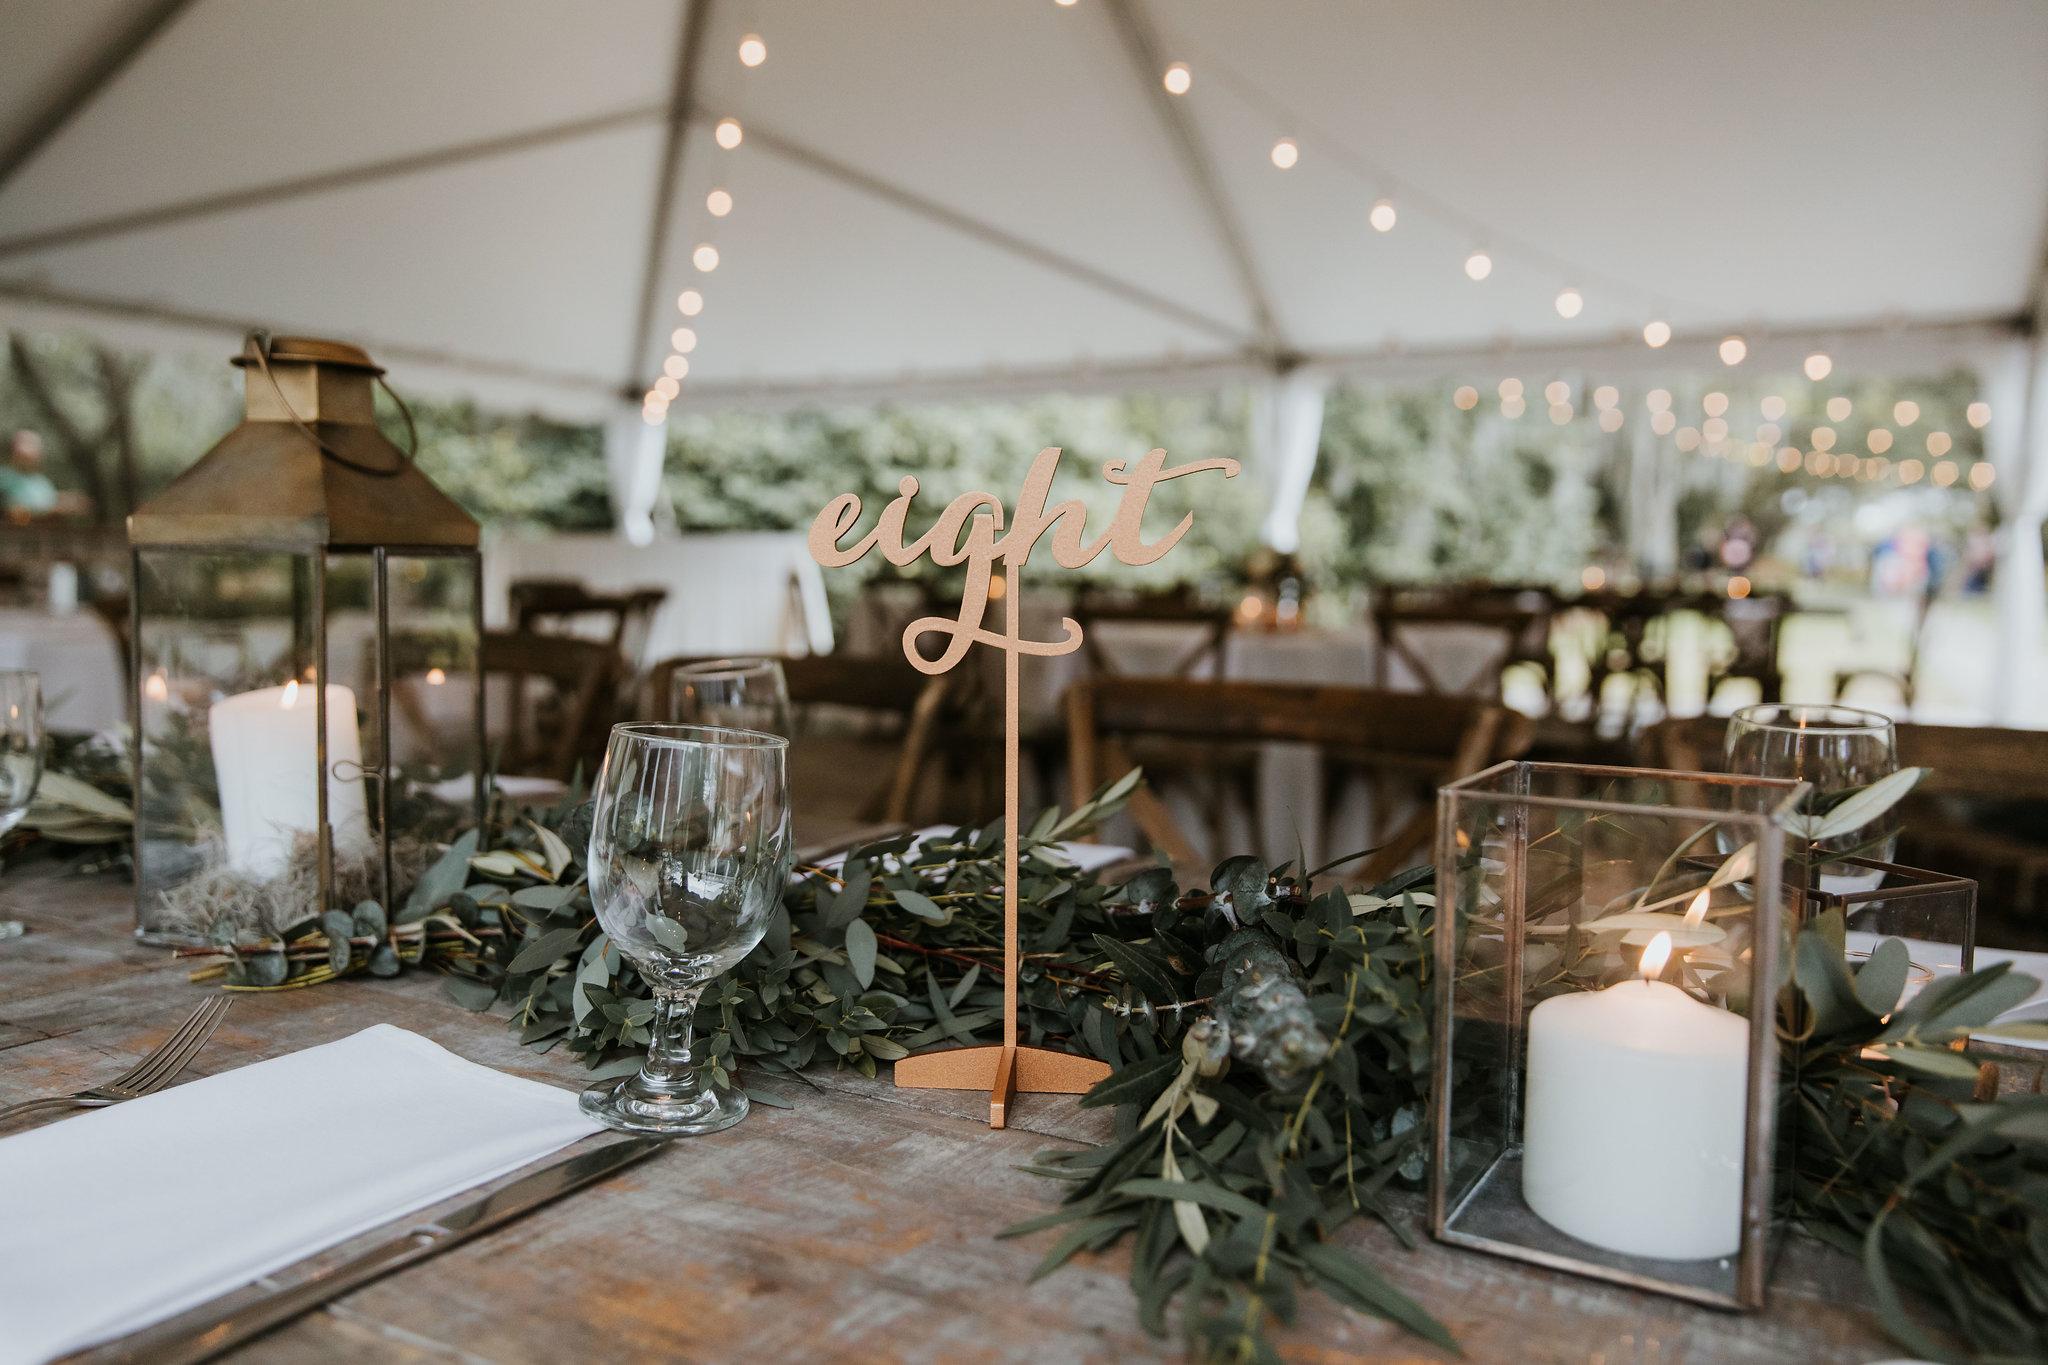 Legare-Waring-House-Charleston-SC-wedding-portrait-photography-403.jpg